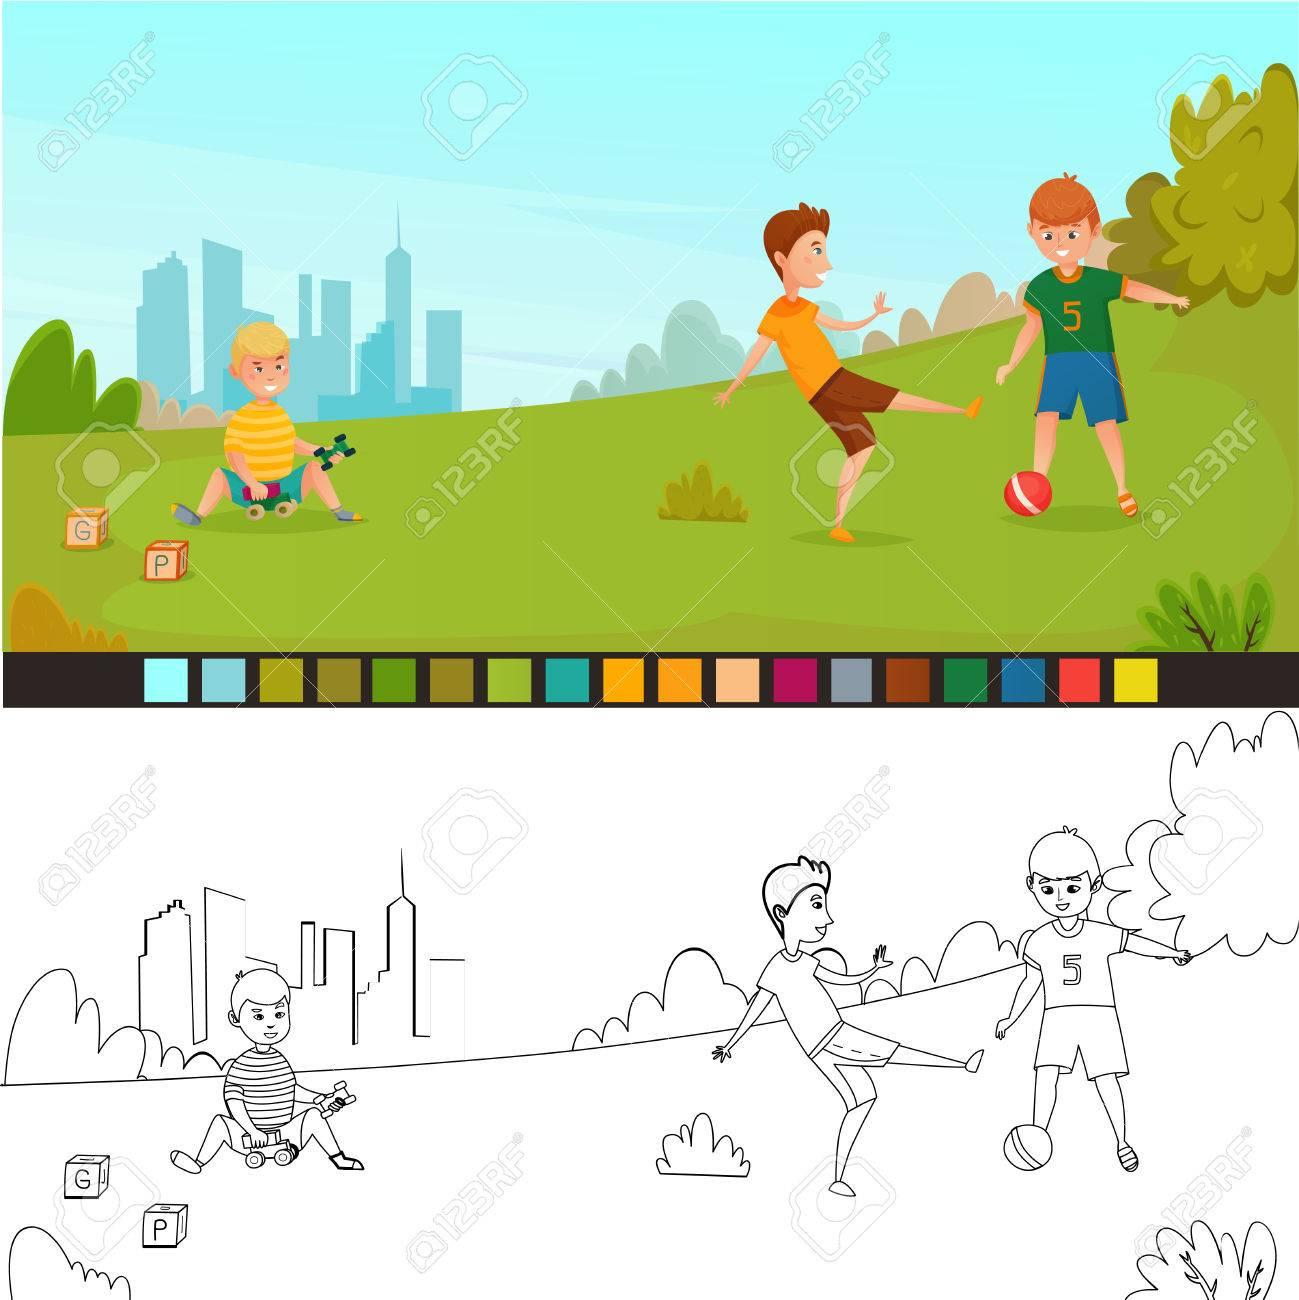 Dibujo Para Colorear Composicion De Ninos Con Dos Fotos No Pintadas